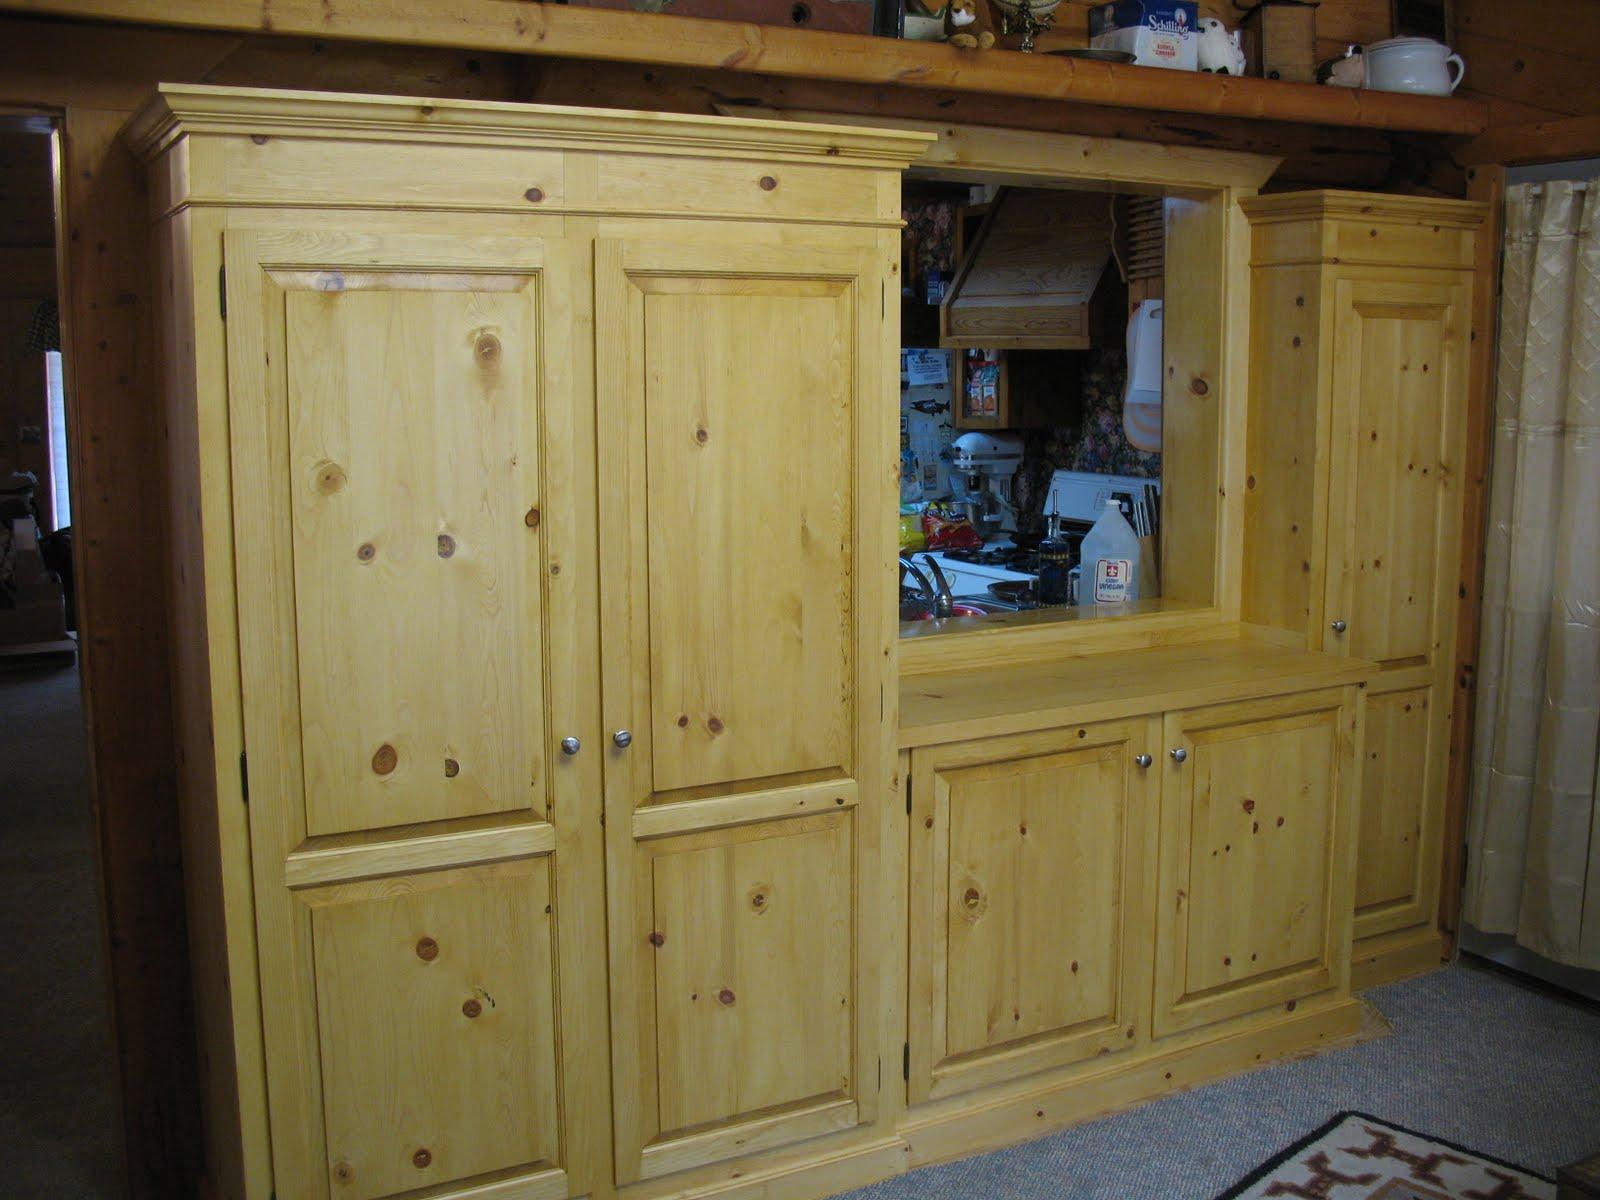 depressioneradesigns: pine pantry storage cabinets